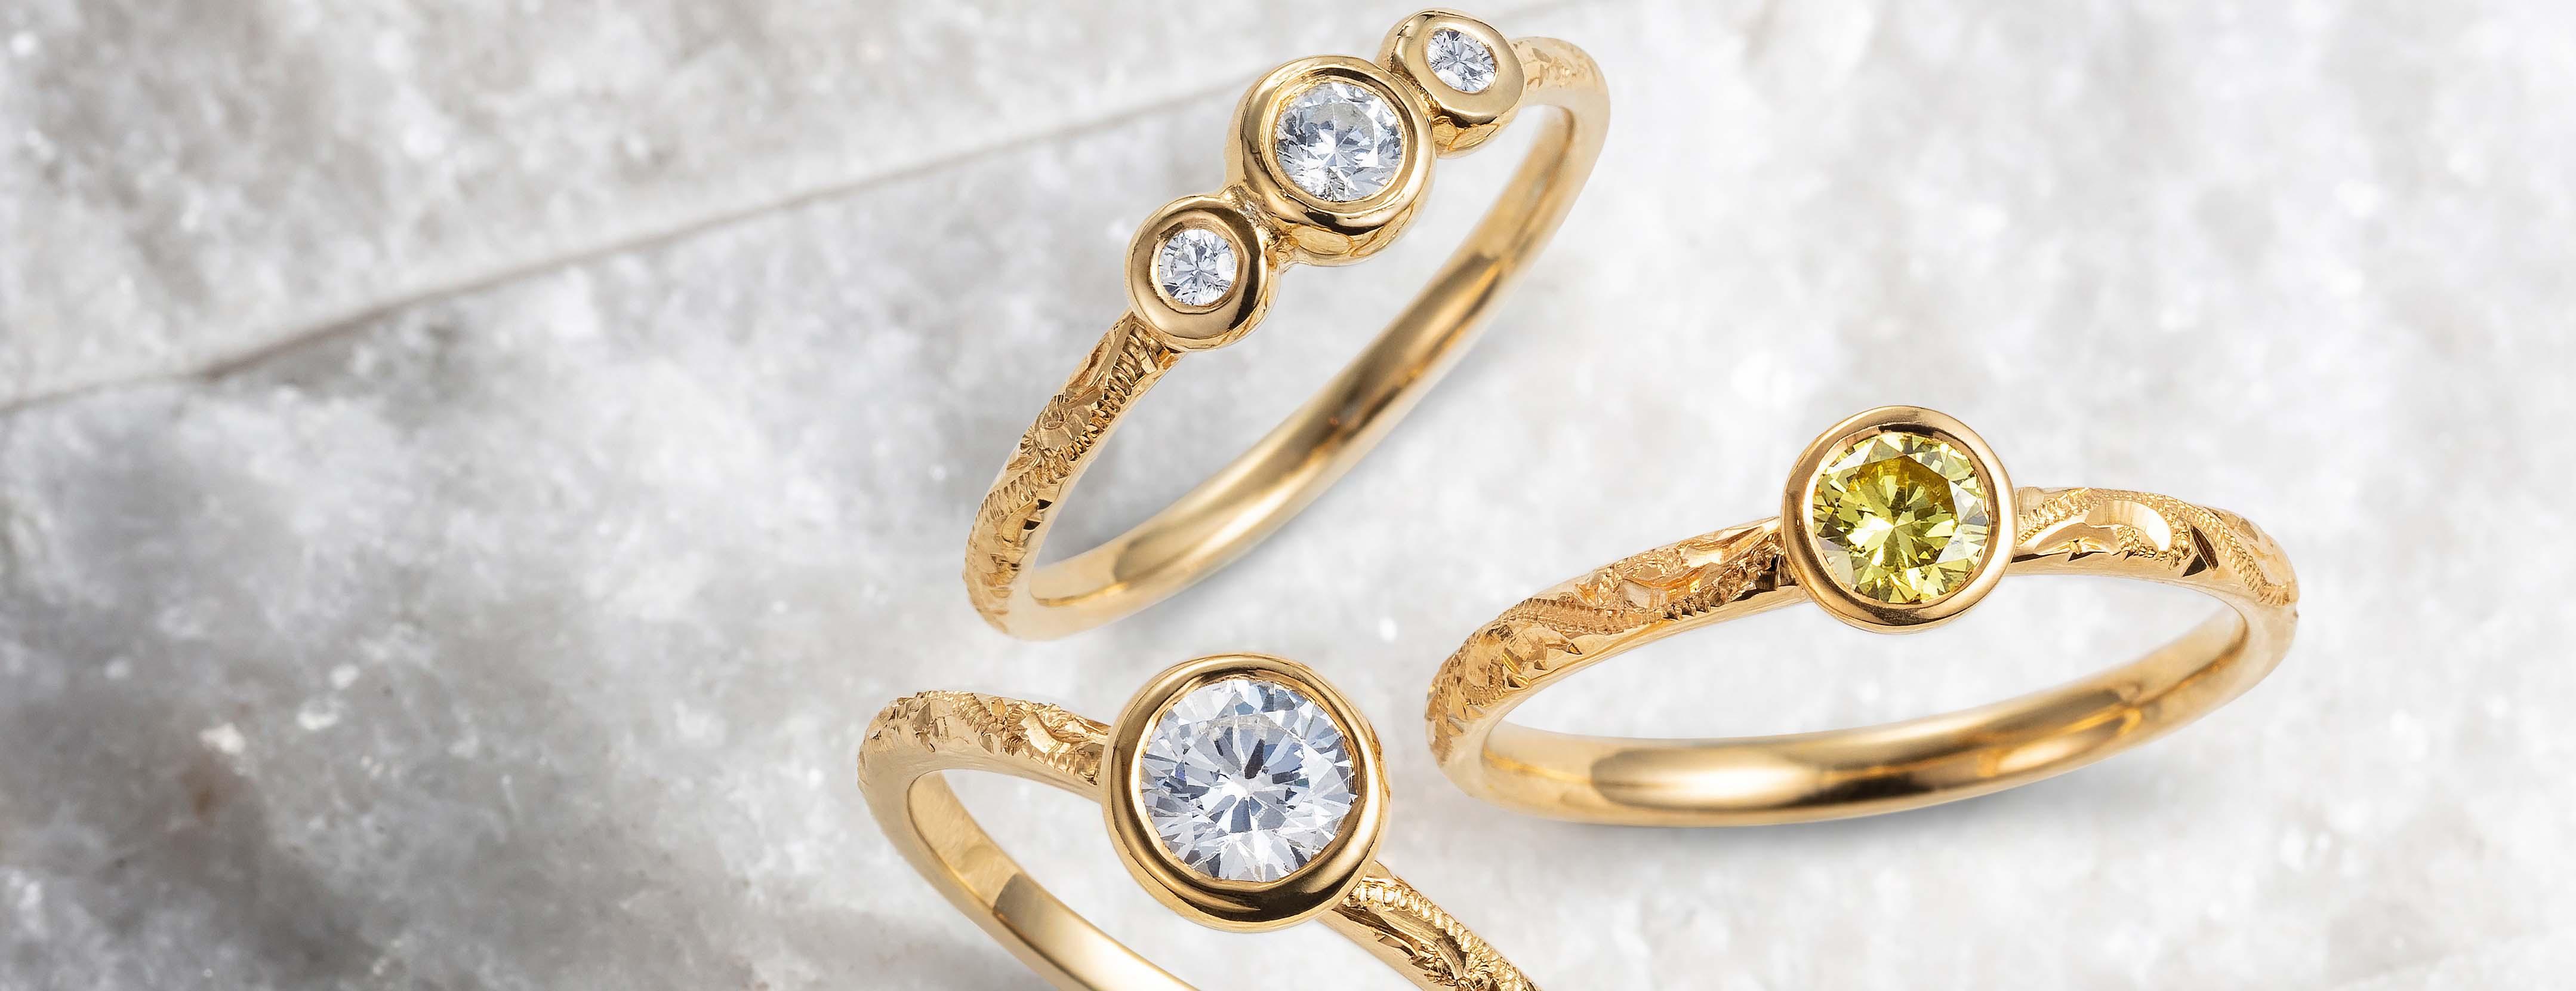 Lebrusan Studio Hera diamond collection